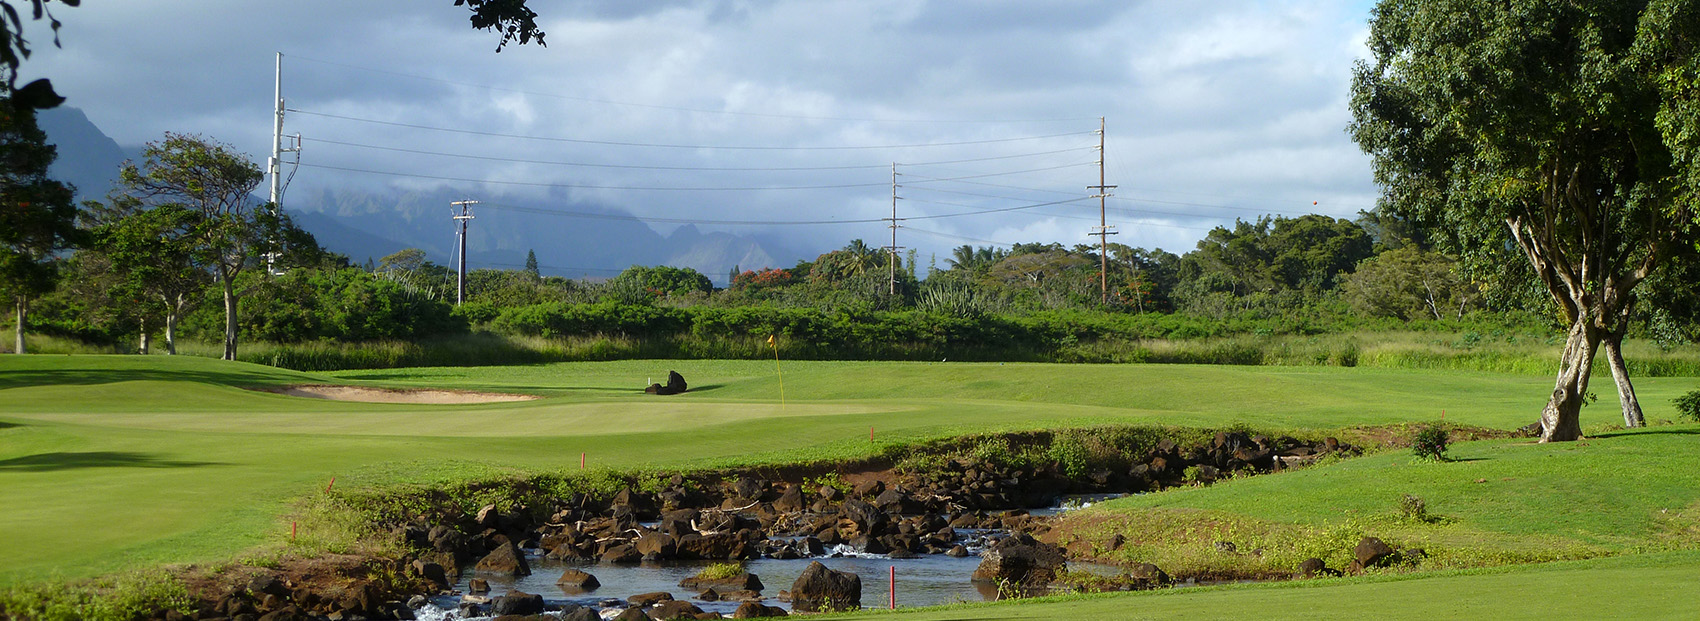 Kauai Lagoons (Championship Ocean Mauka/Moana)